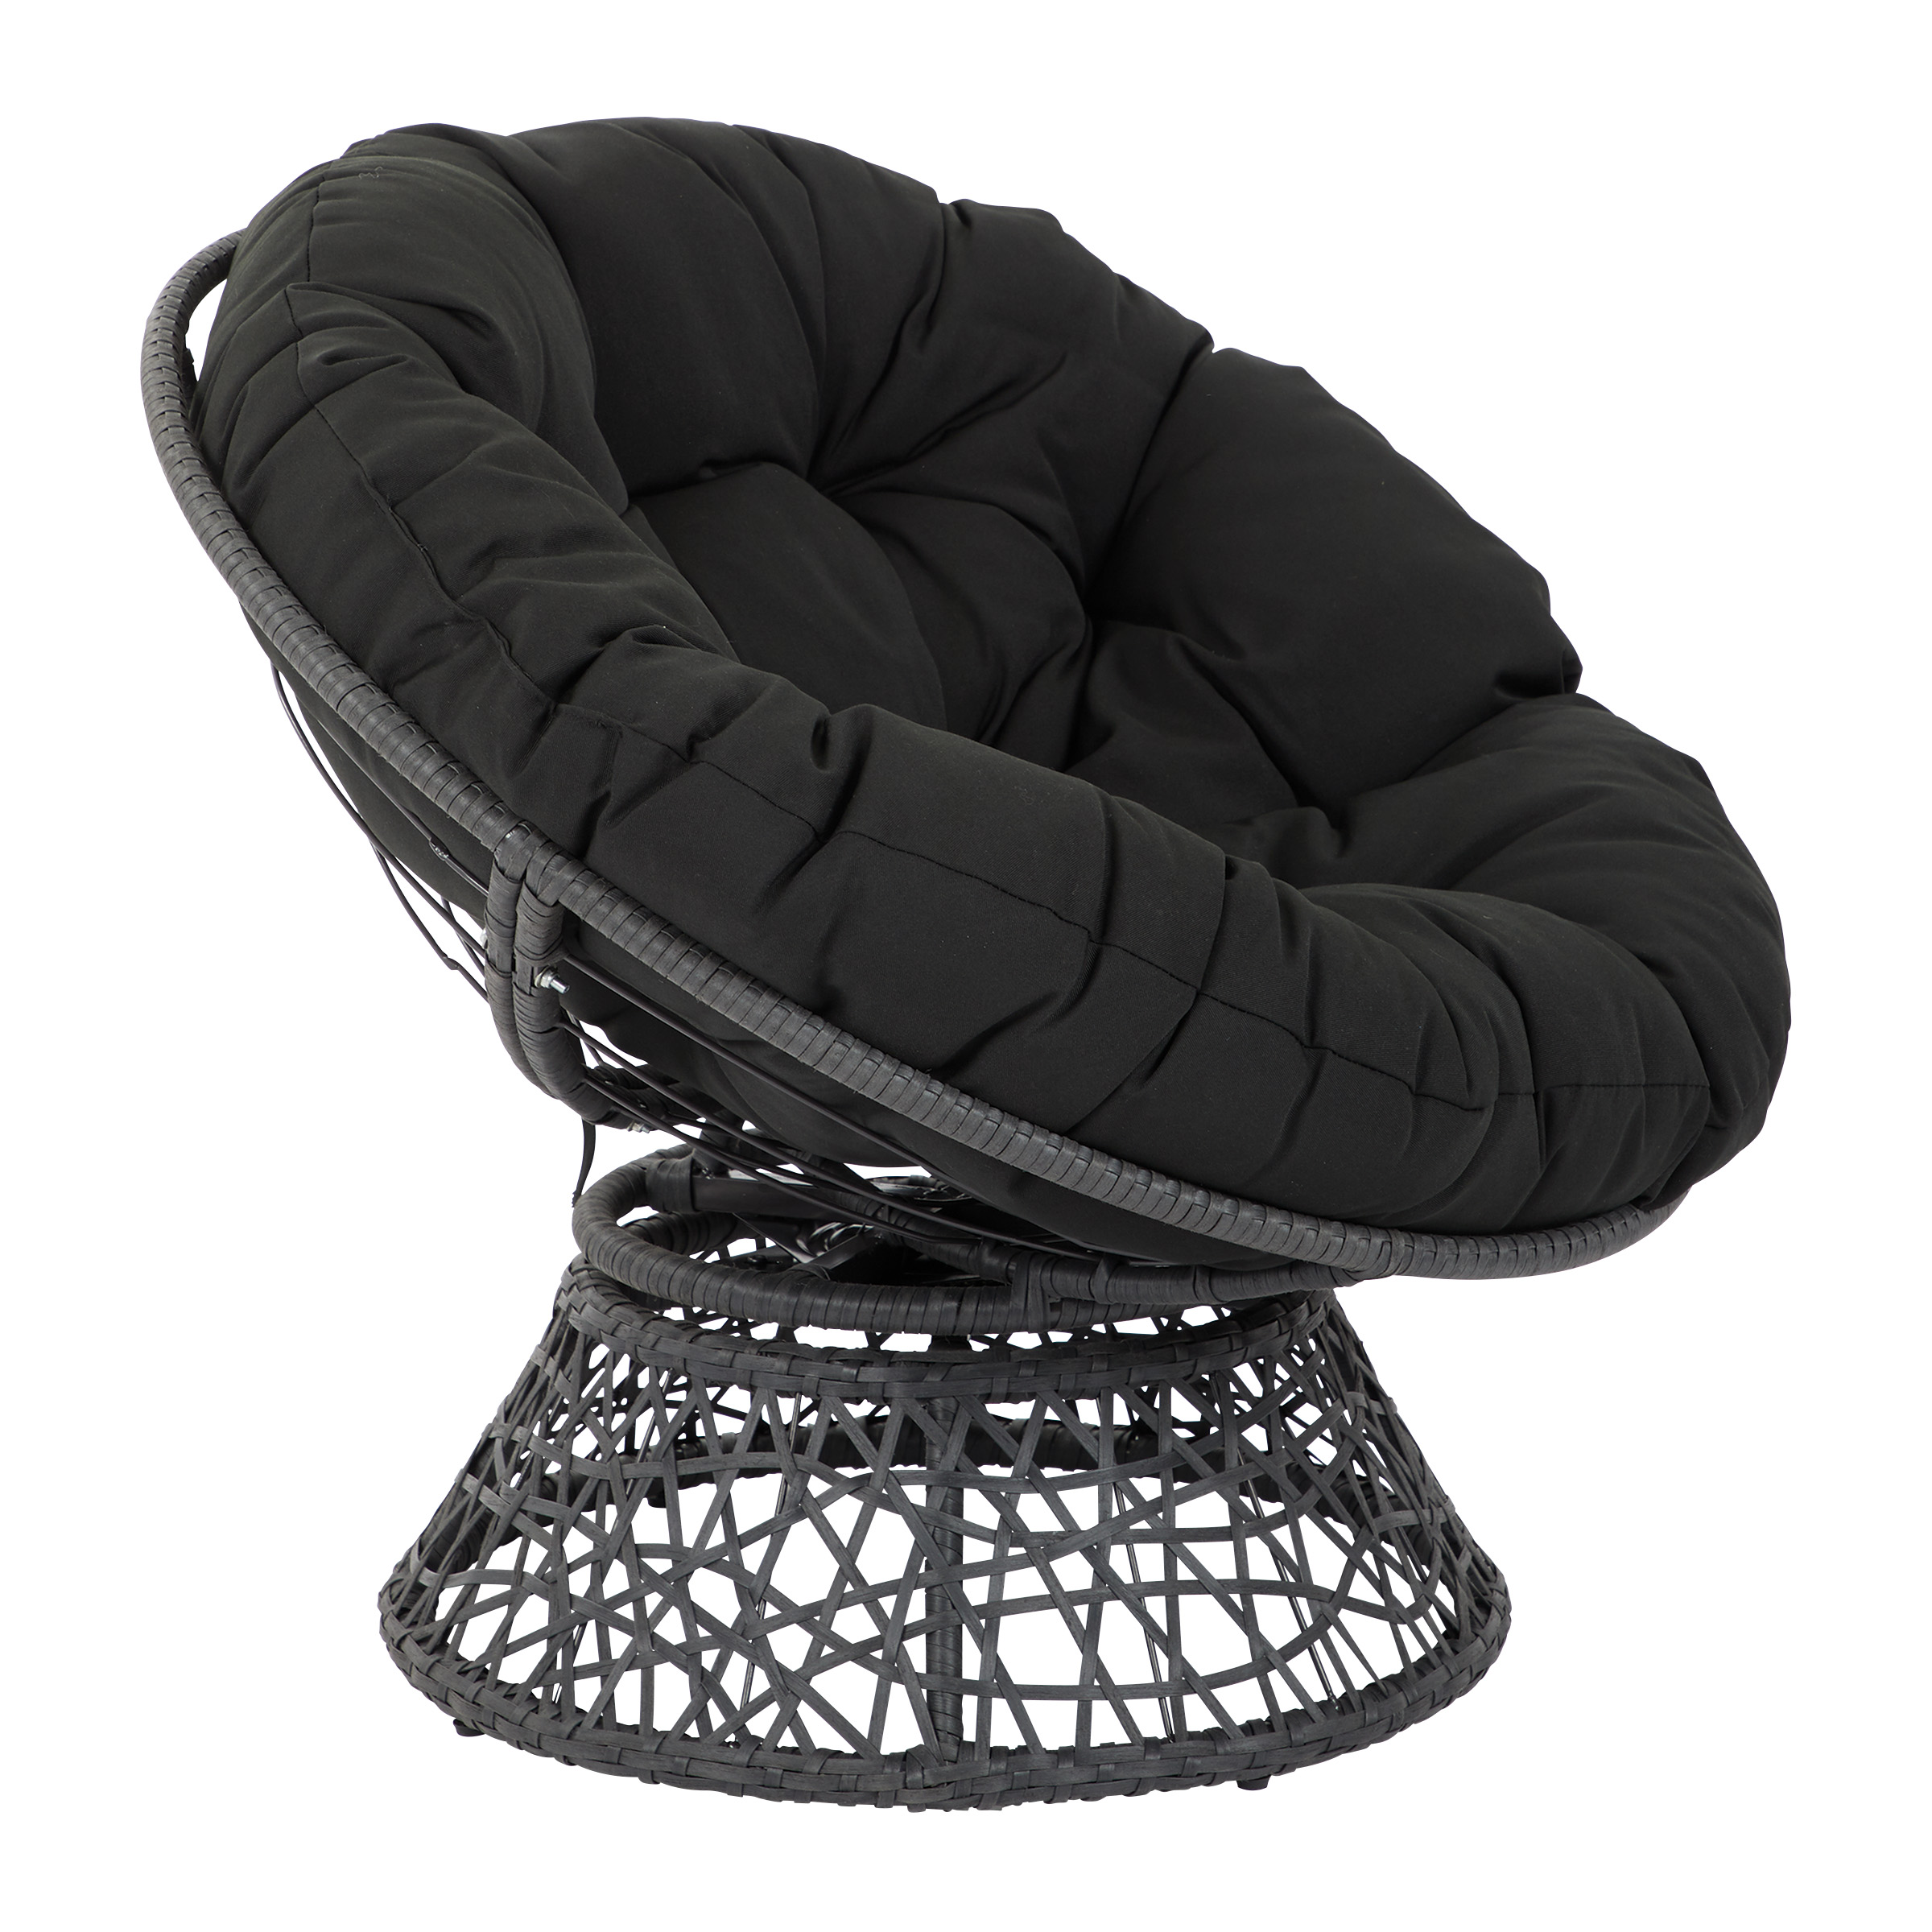 Papasan Chair with Black cushion and Black Frame  Deal